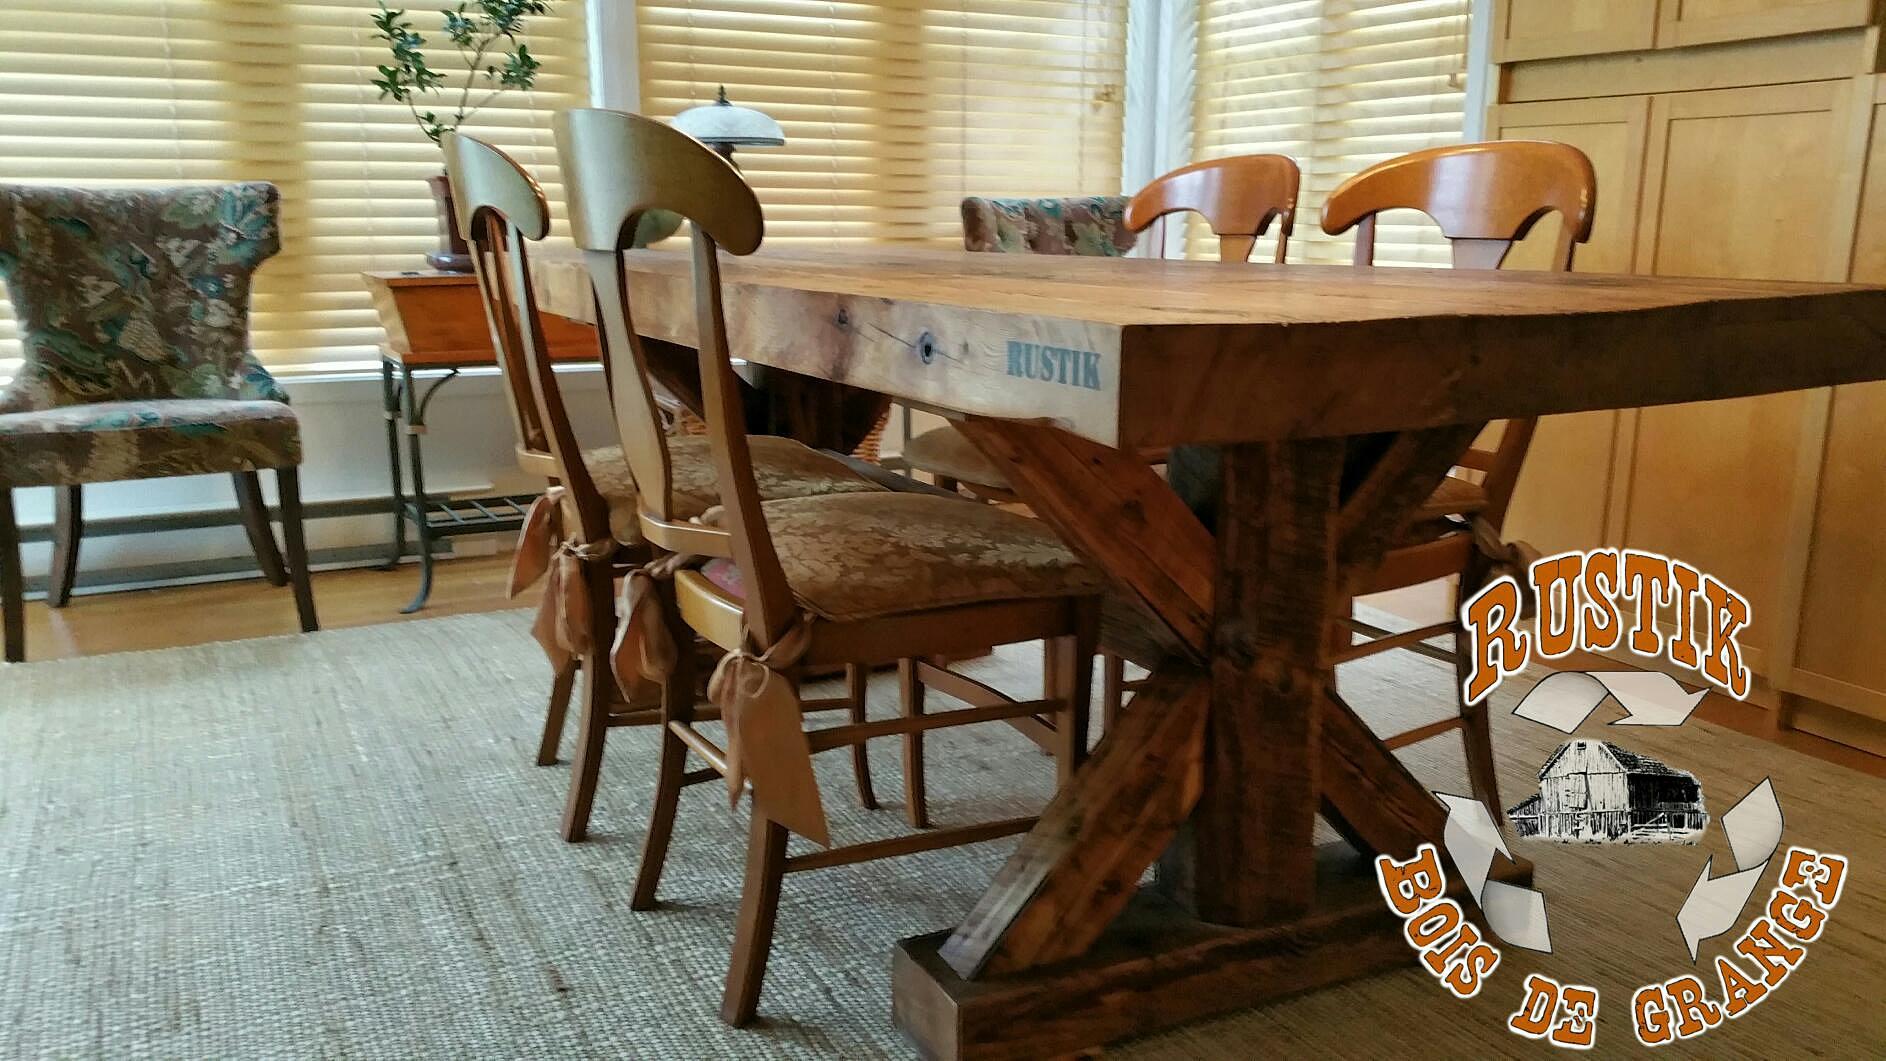 Table De Cuisine Bois #4: Dc2bb9_11c7fafe3dca4a119915482200db400b.jpg_srz_1886_1061_85_22_0.50_1.20_0.00_jpg_srz